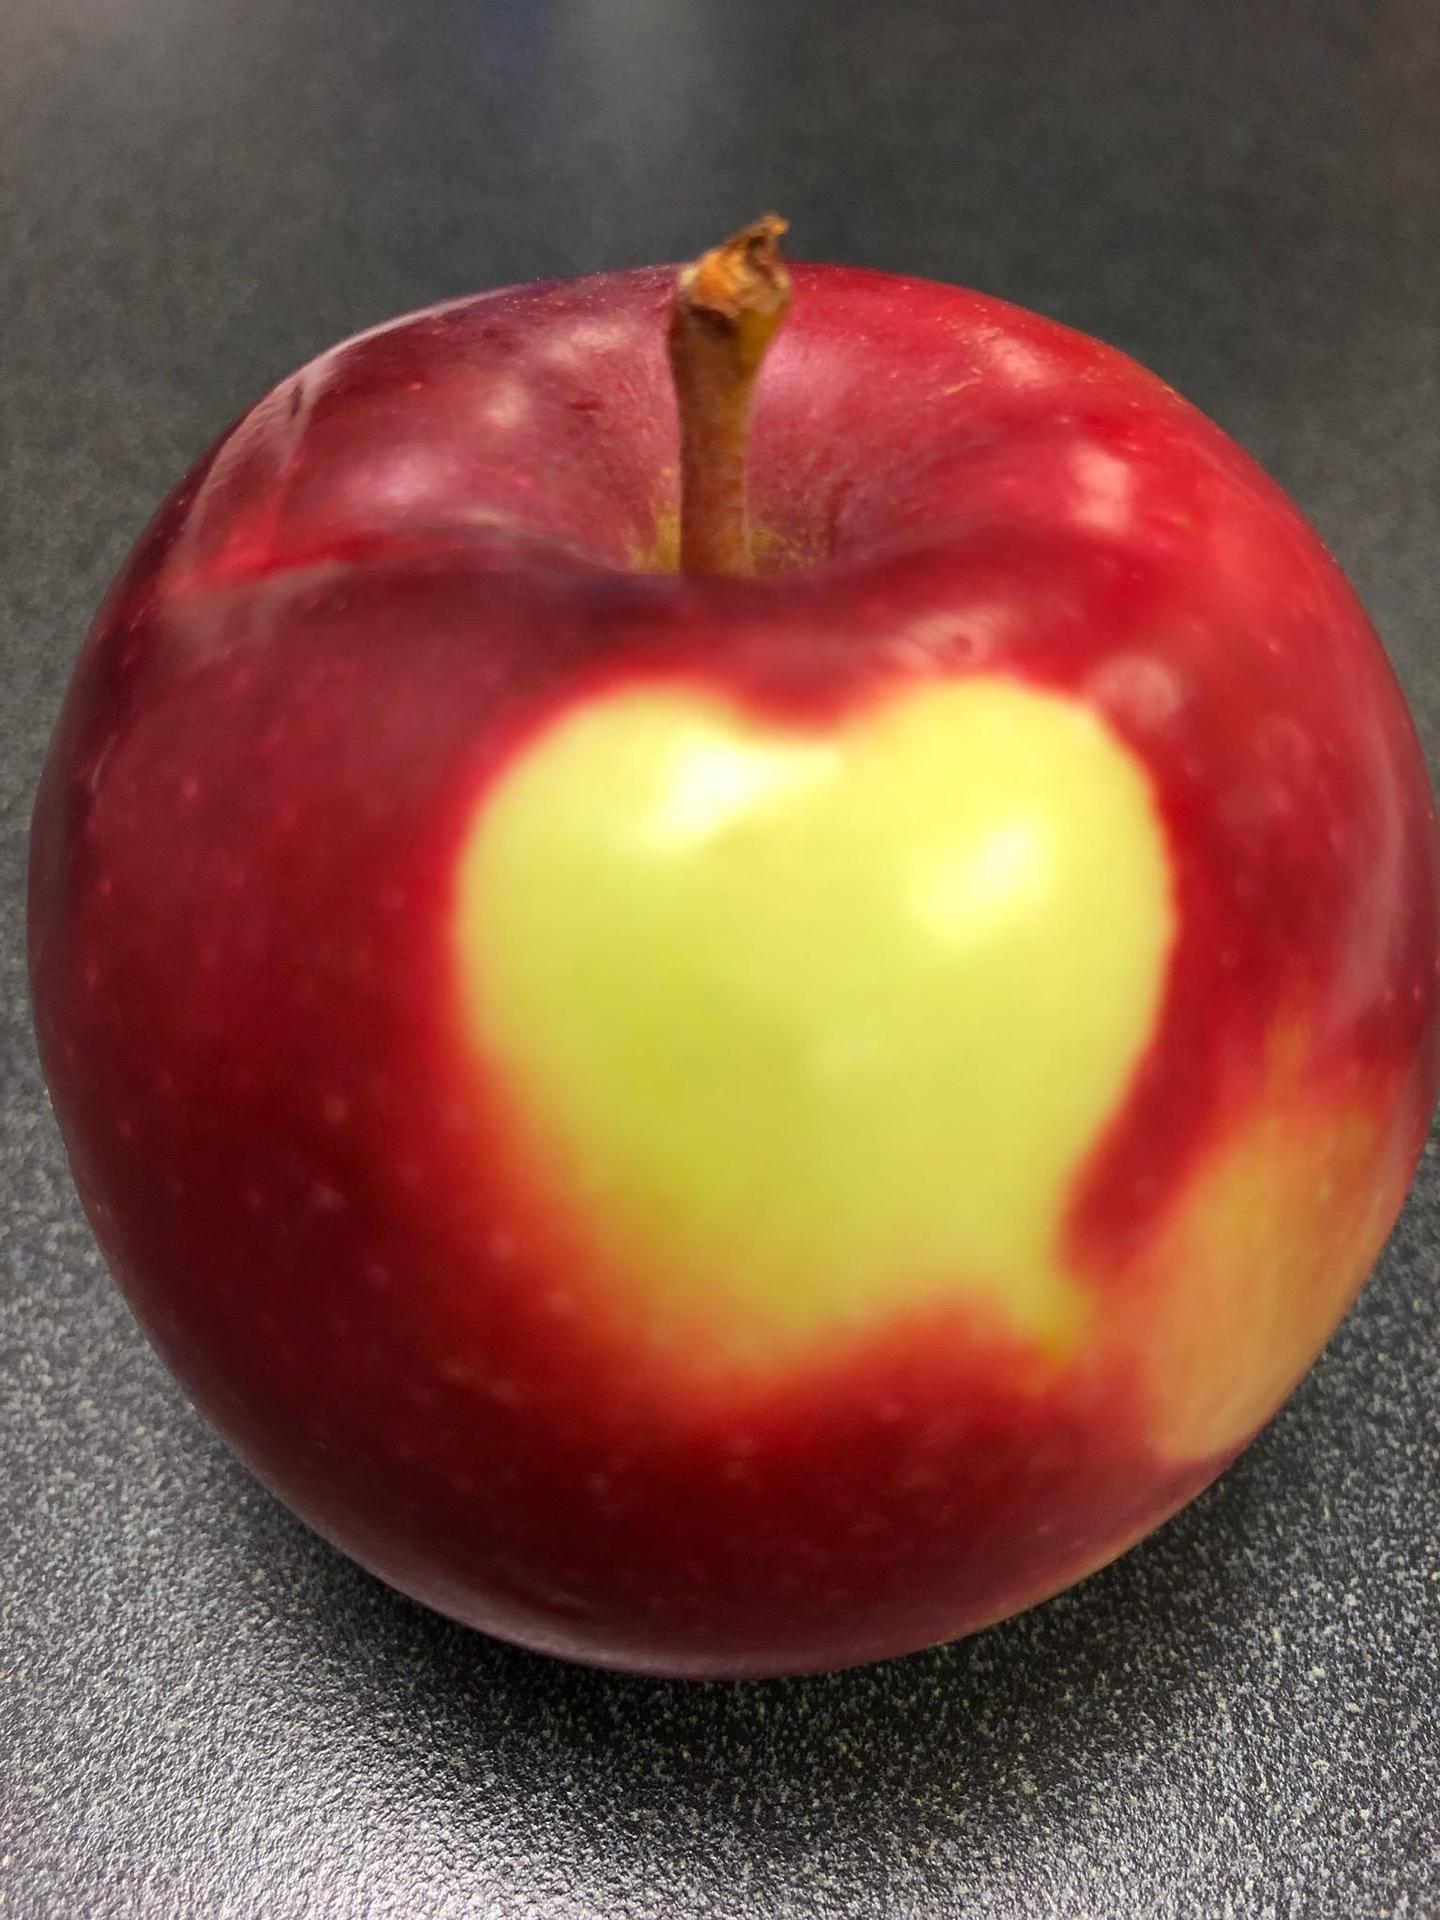 We love apples!